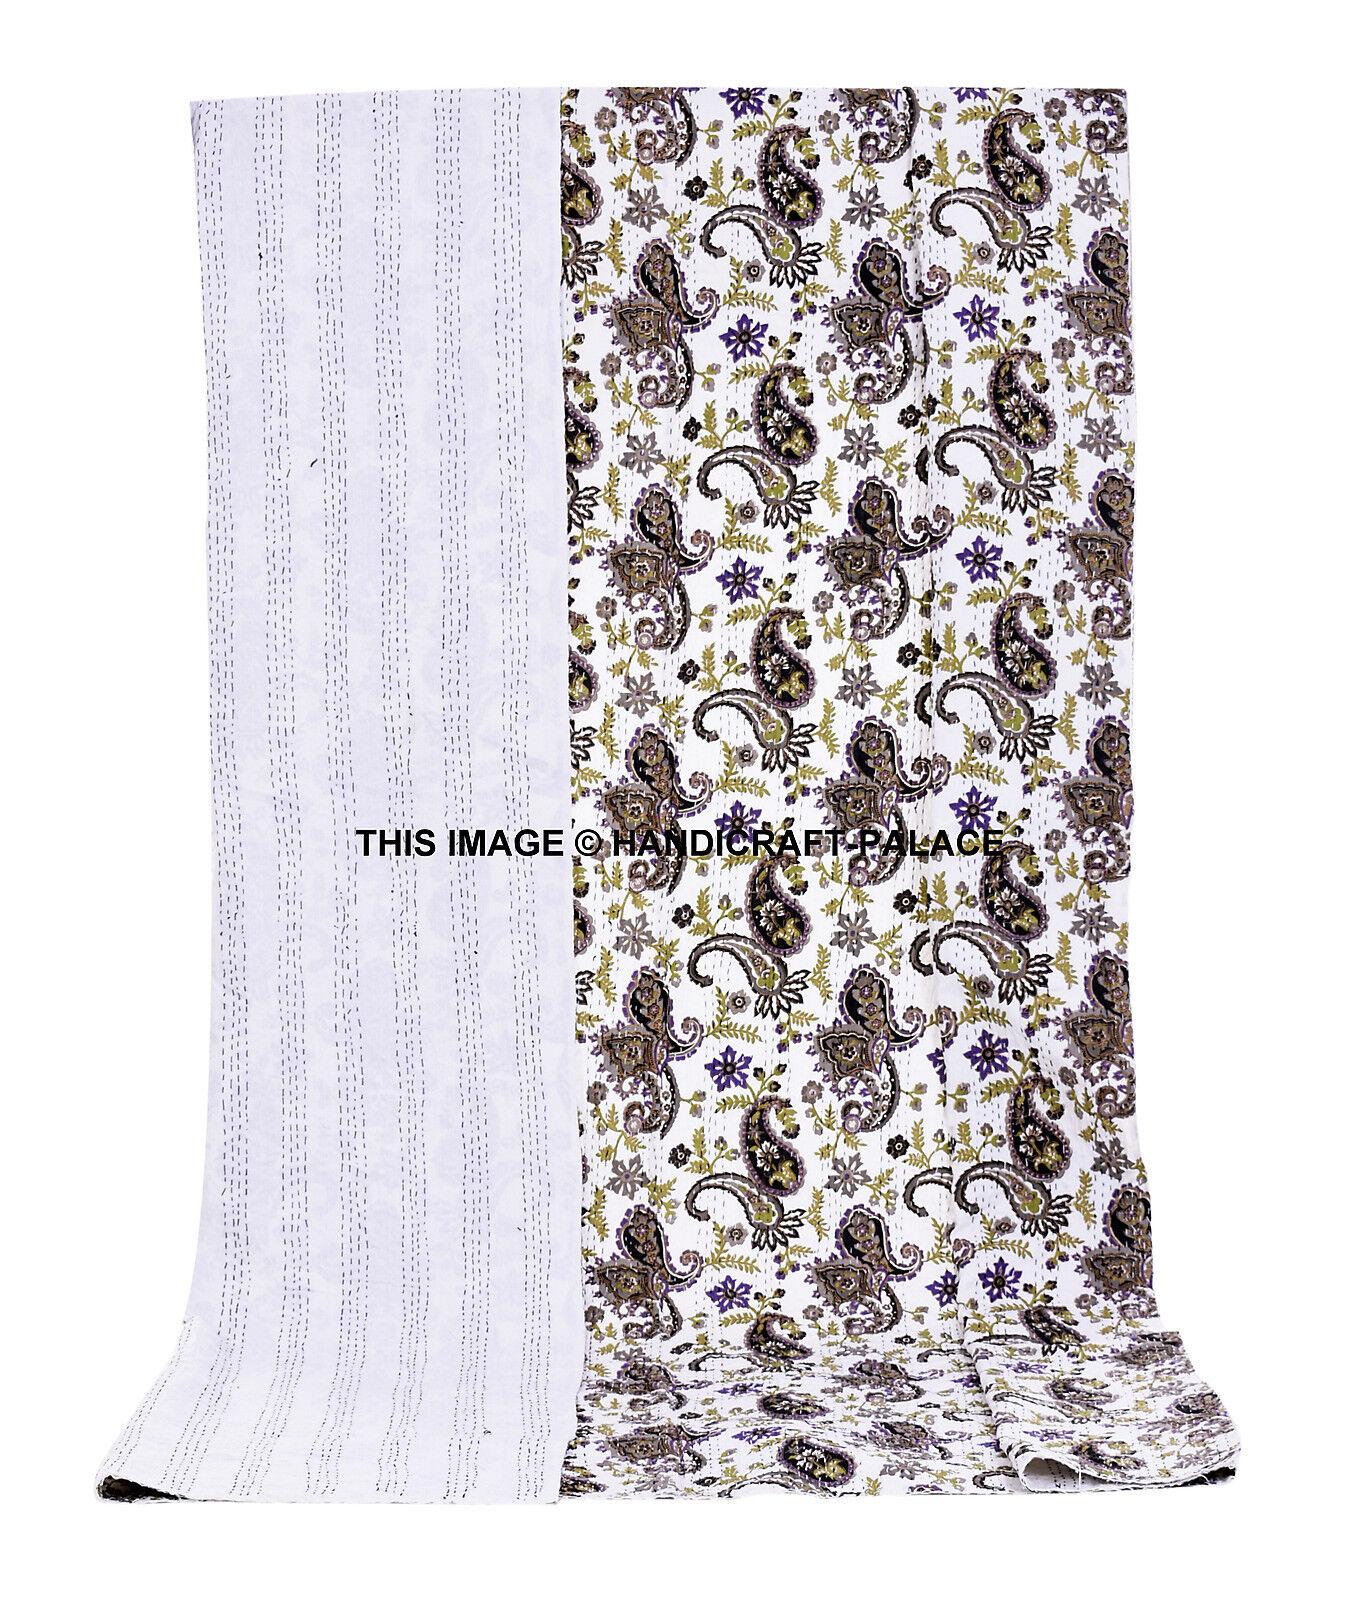 Indian Quilt Paisley Printed Kantha Bedspread Cotton Throw Weiß Queen Blanket